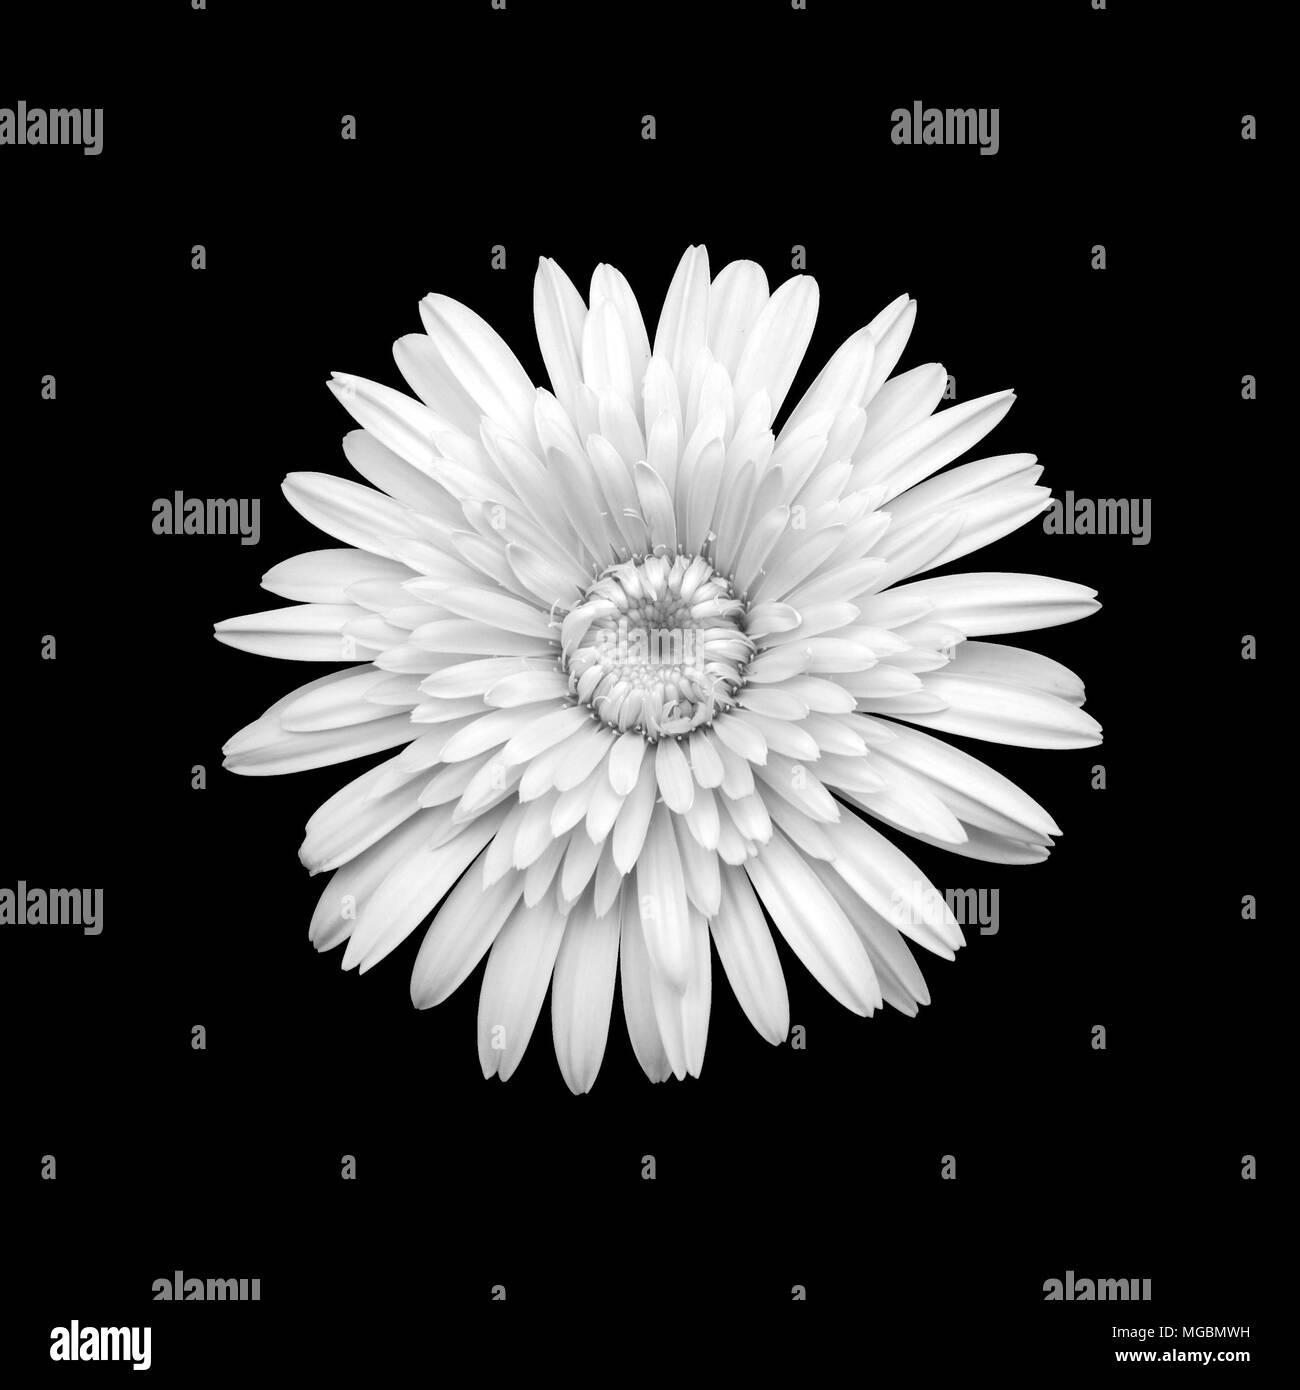 Black and white chrysanthemum flower stock photo 182196045 alamy black and white chrysanthemum flower mightylinksfo